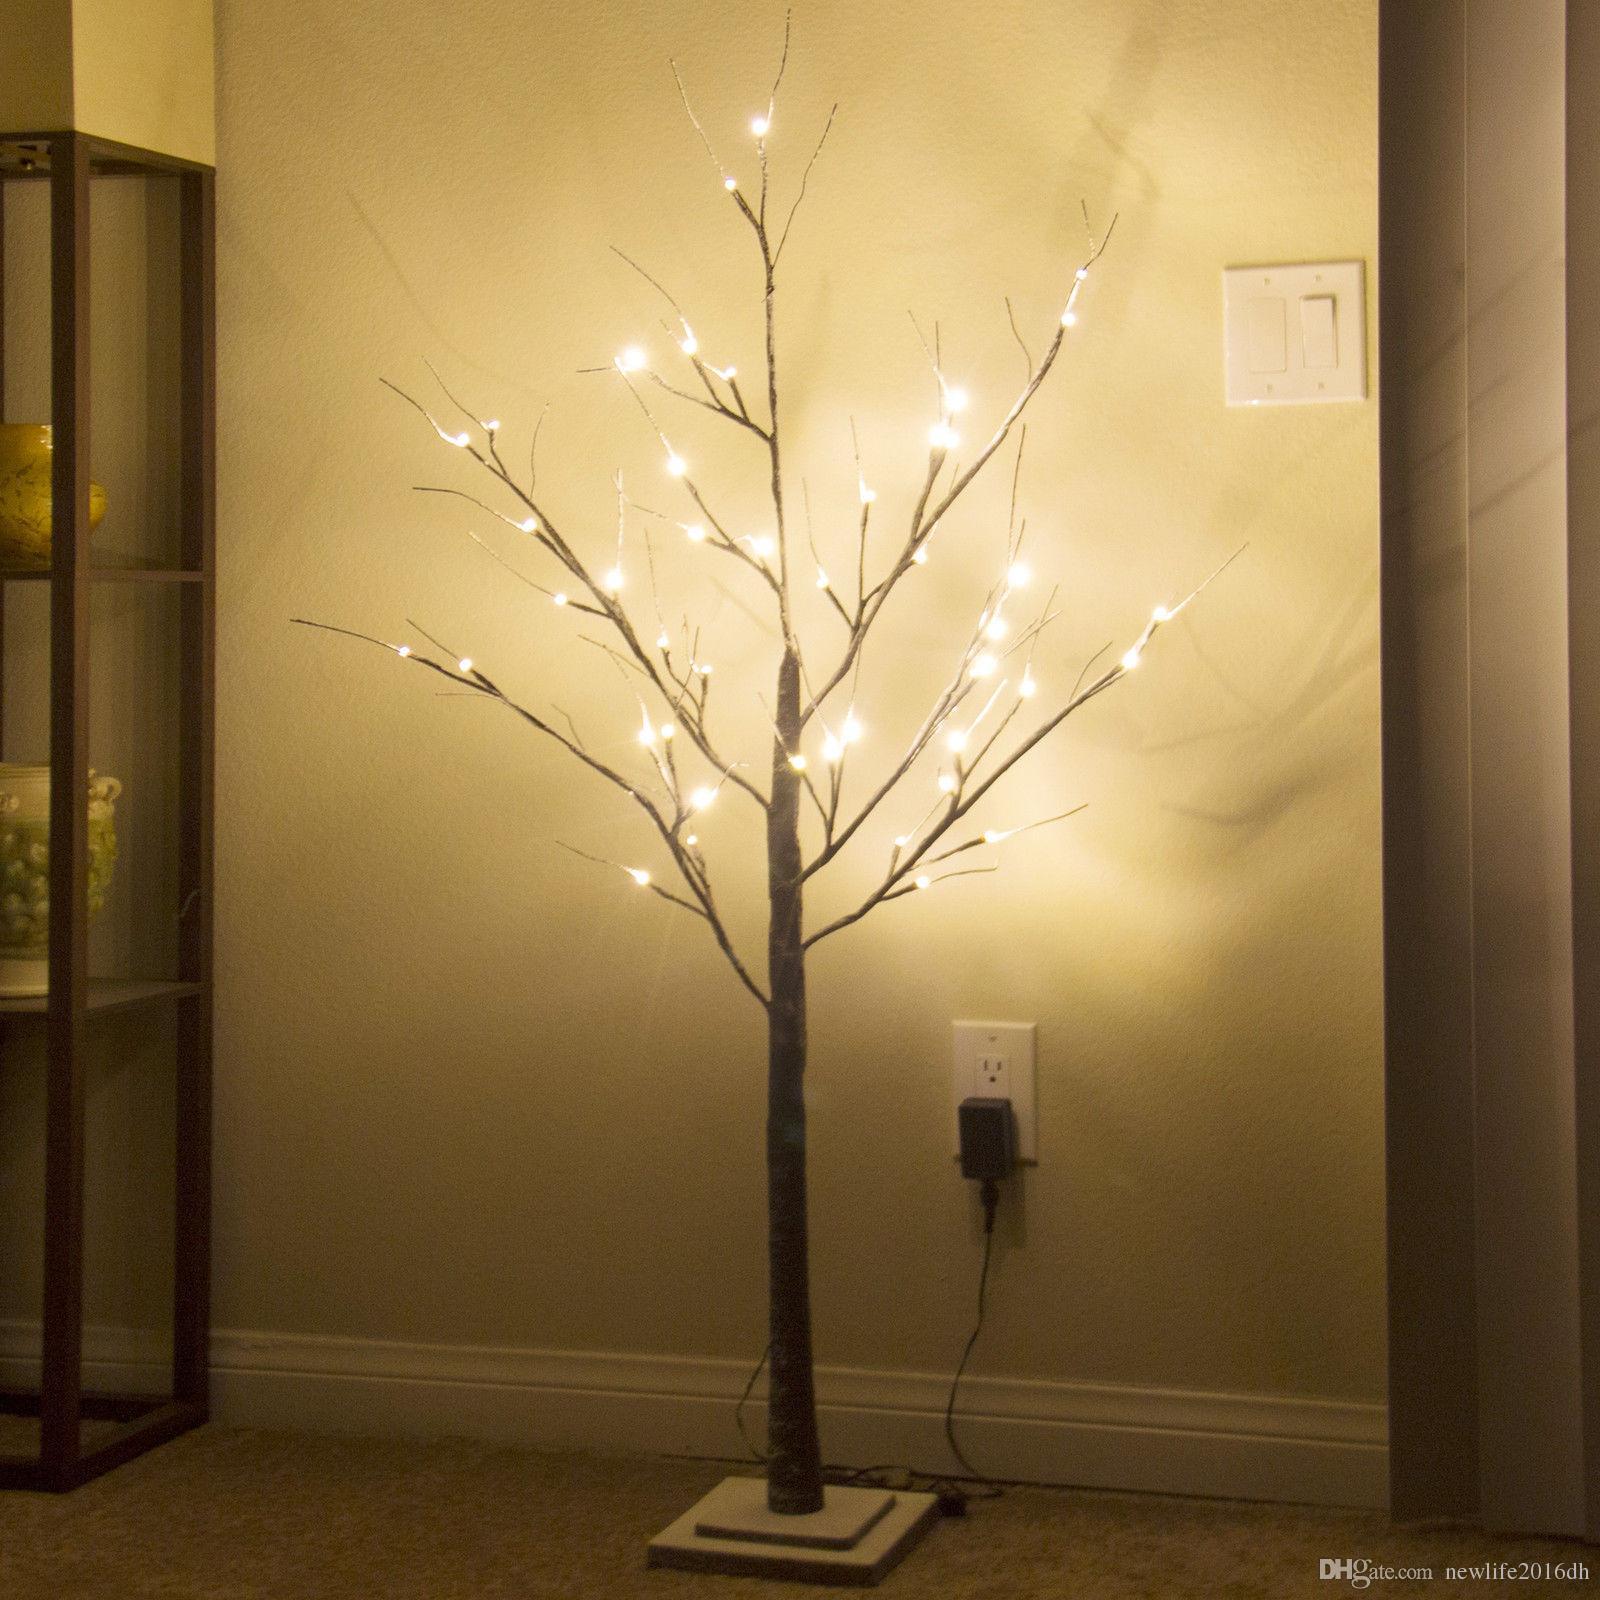 4FT-LED-Decorative-Tree-Lights-Home-Festival-Party-Christmas-Wedding-Warm-White 4FT-LED-Decorative-Tree-Lights-Home-Festival-Party-Christm